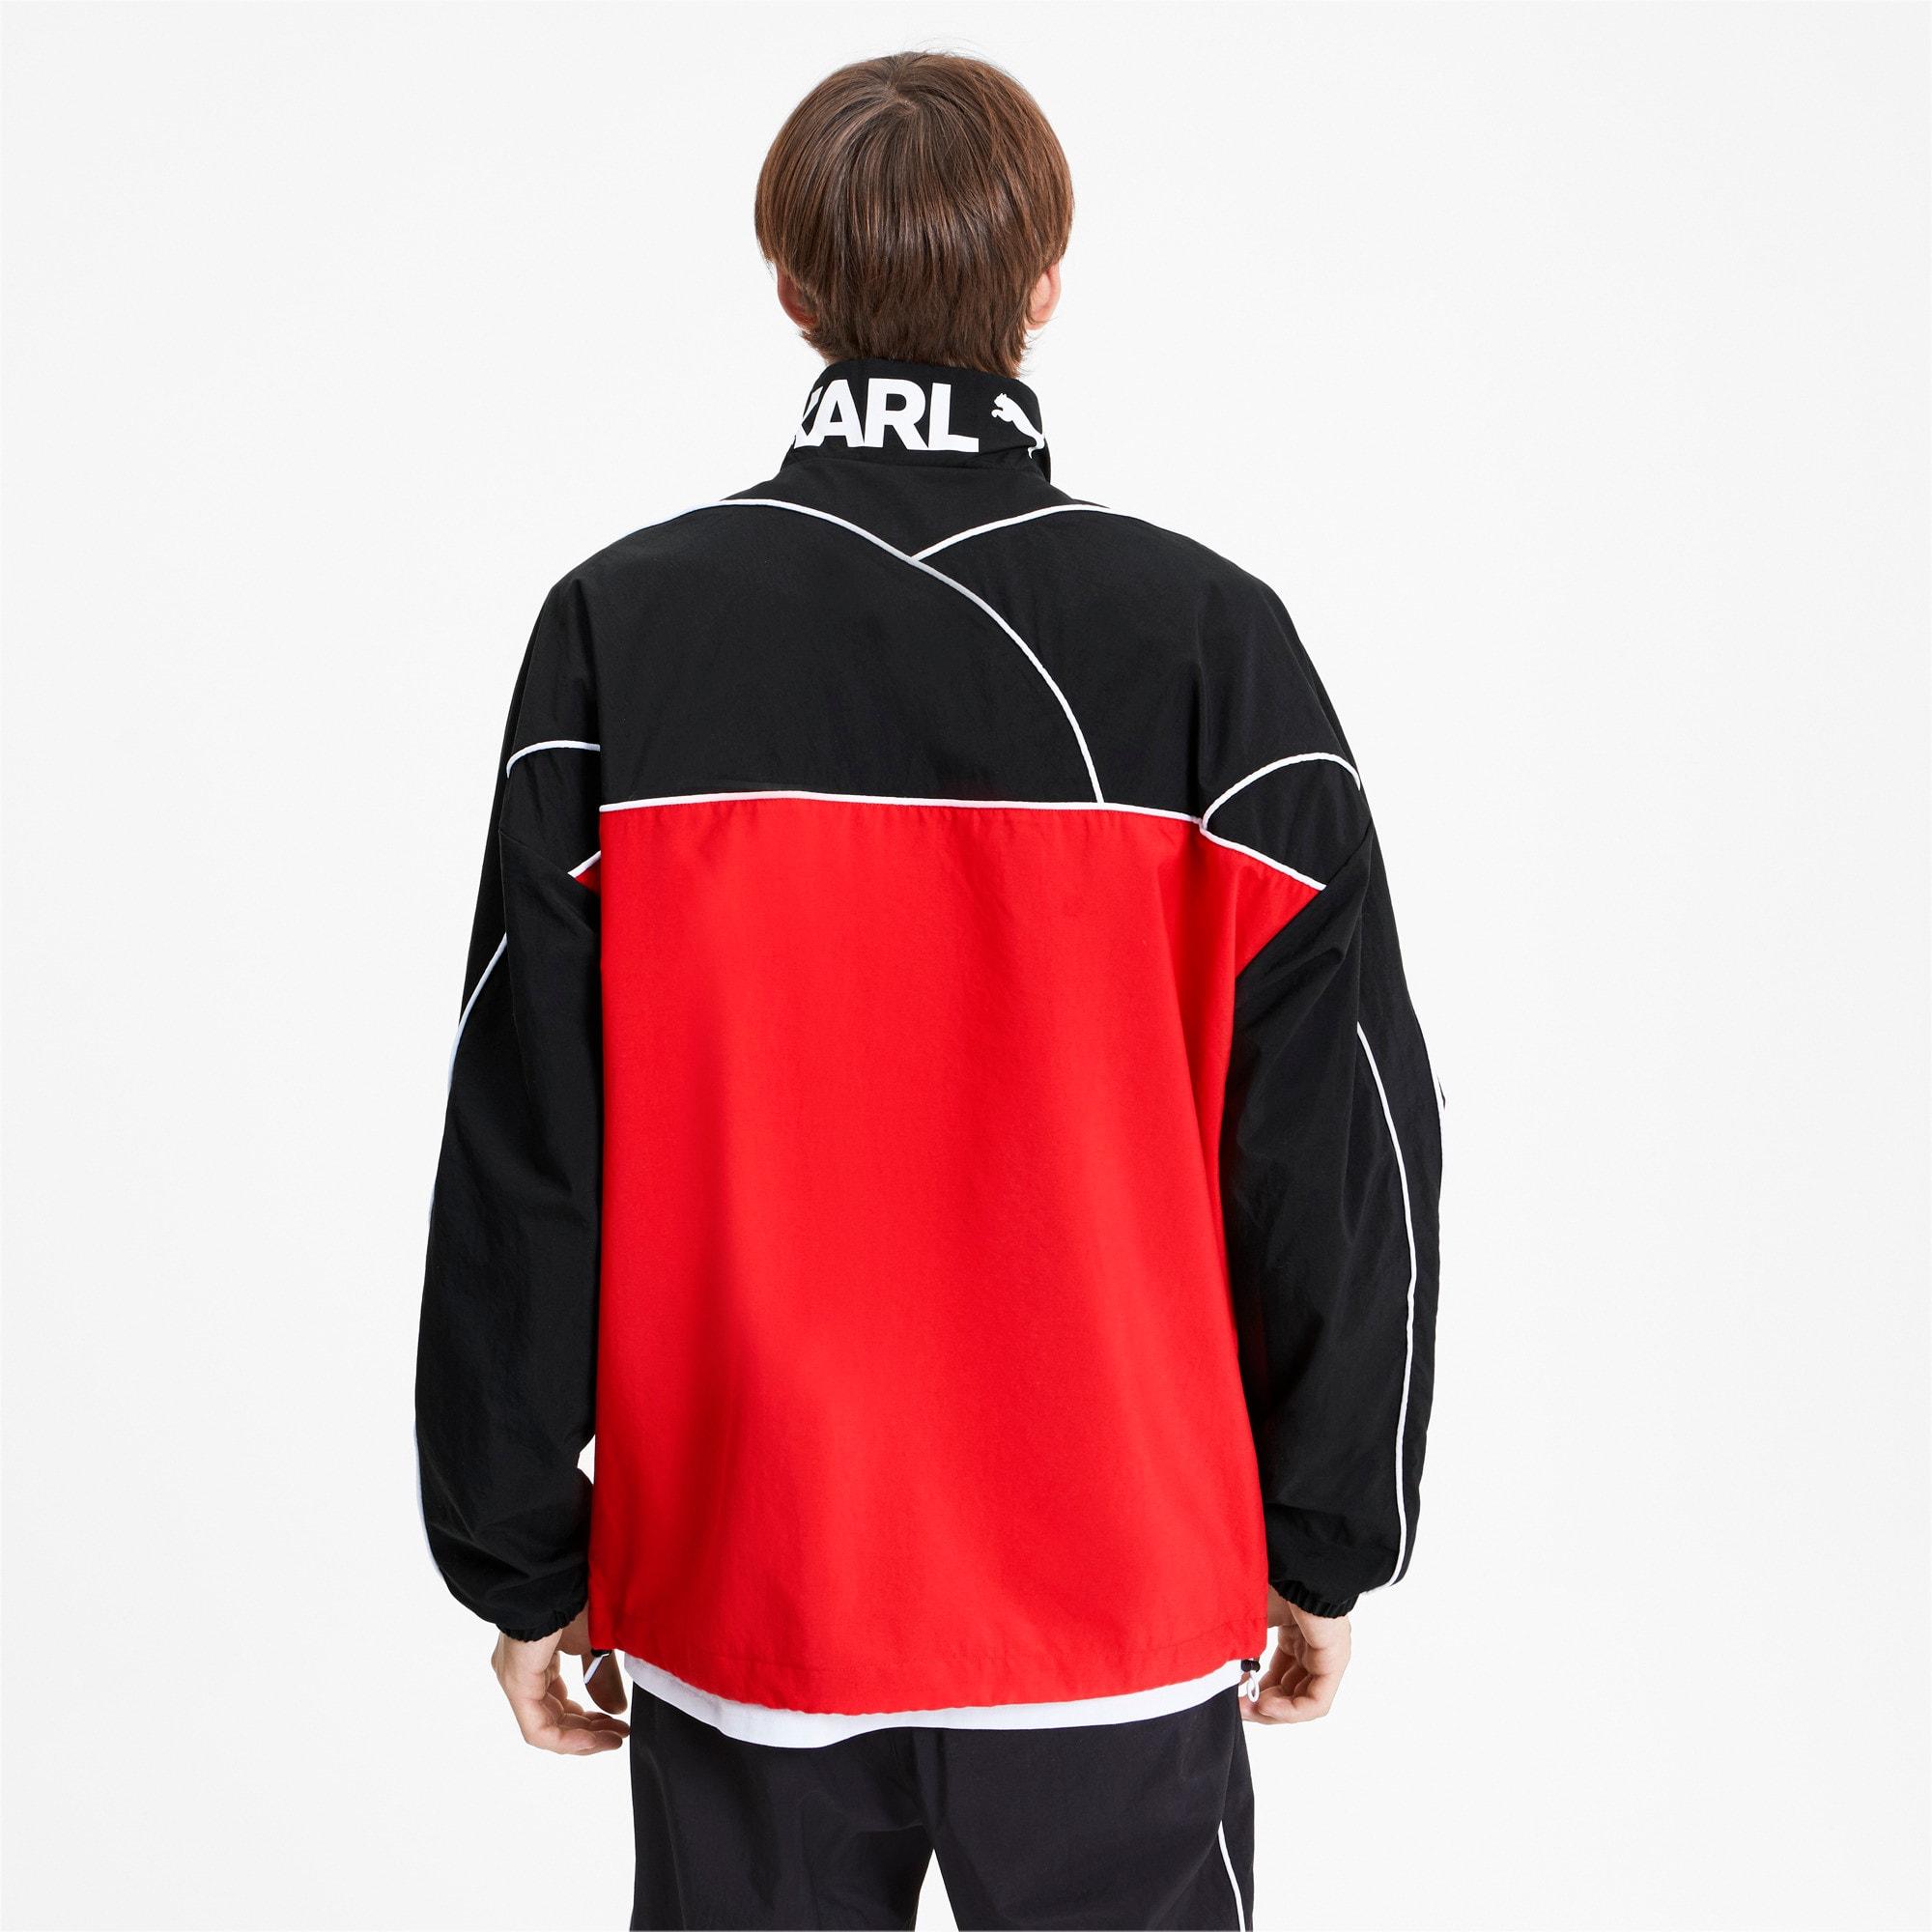 Thumbnail 2 of PUMA x KARL LAGERFELD Men's Track Jacket, Puma Black, medium